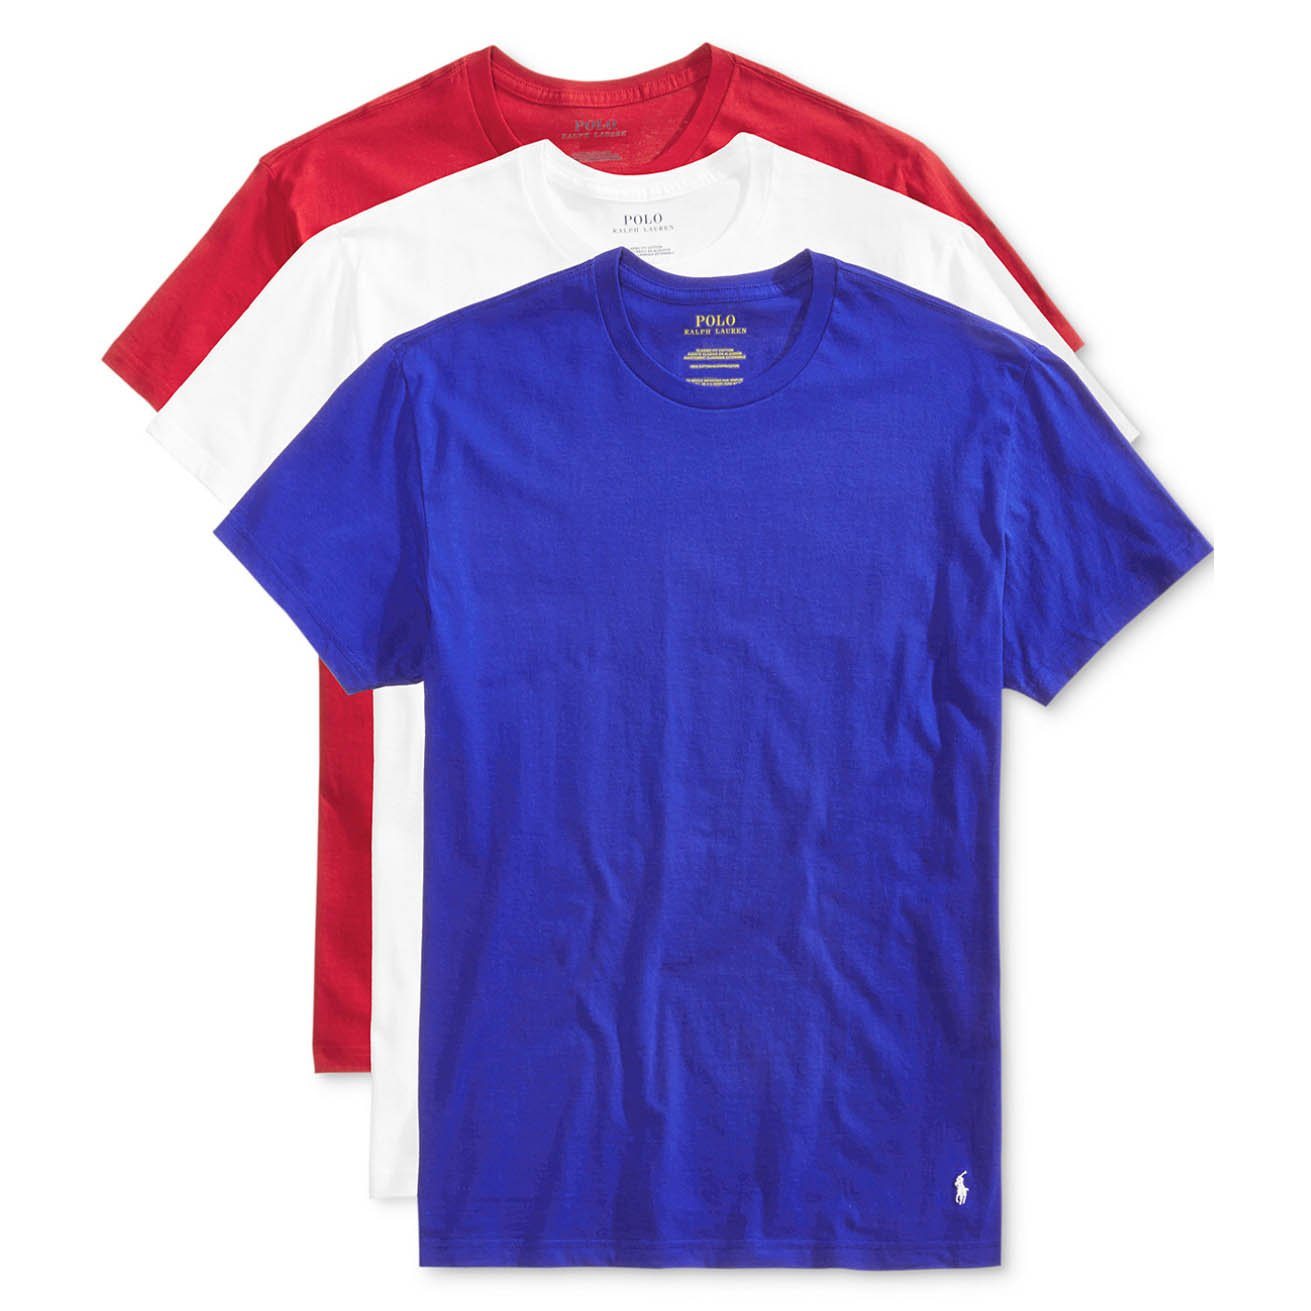 4e9d7e2a62a4 Polo Ralph Lauren Men s Classic Crew Neck Undershirts 3-Pack at Amazon Men s  Clothing store